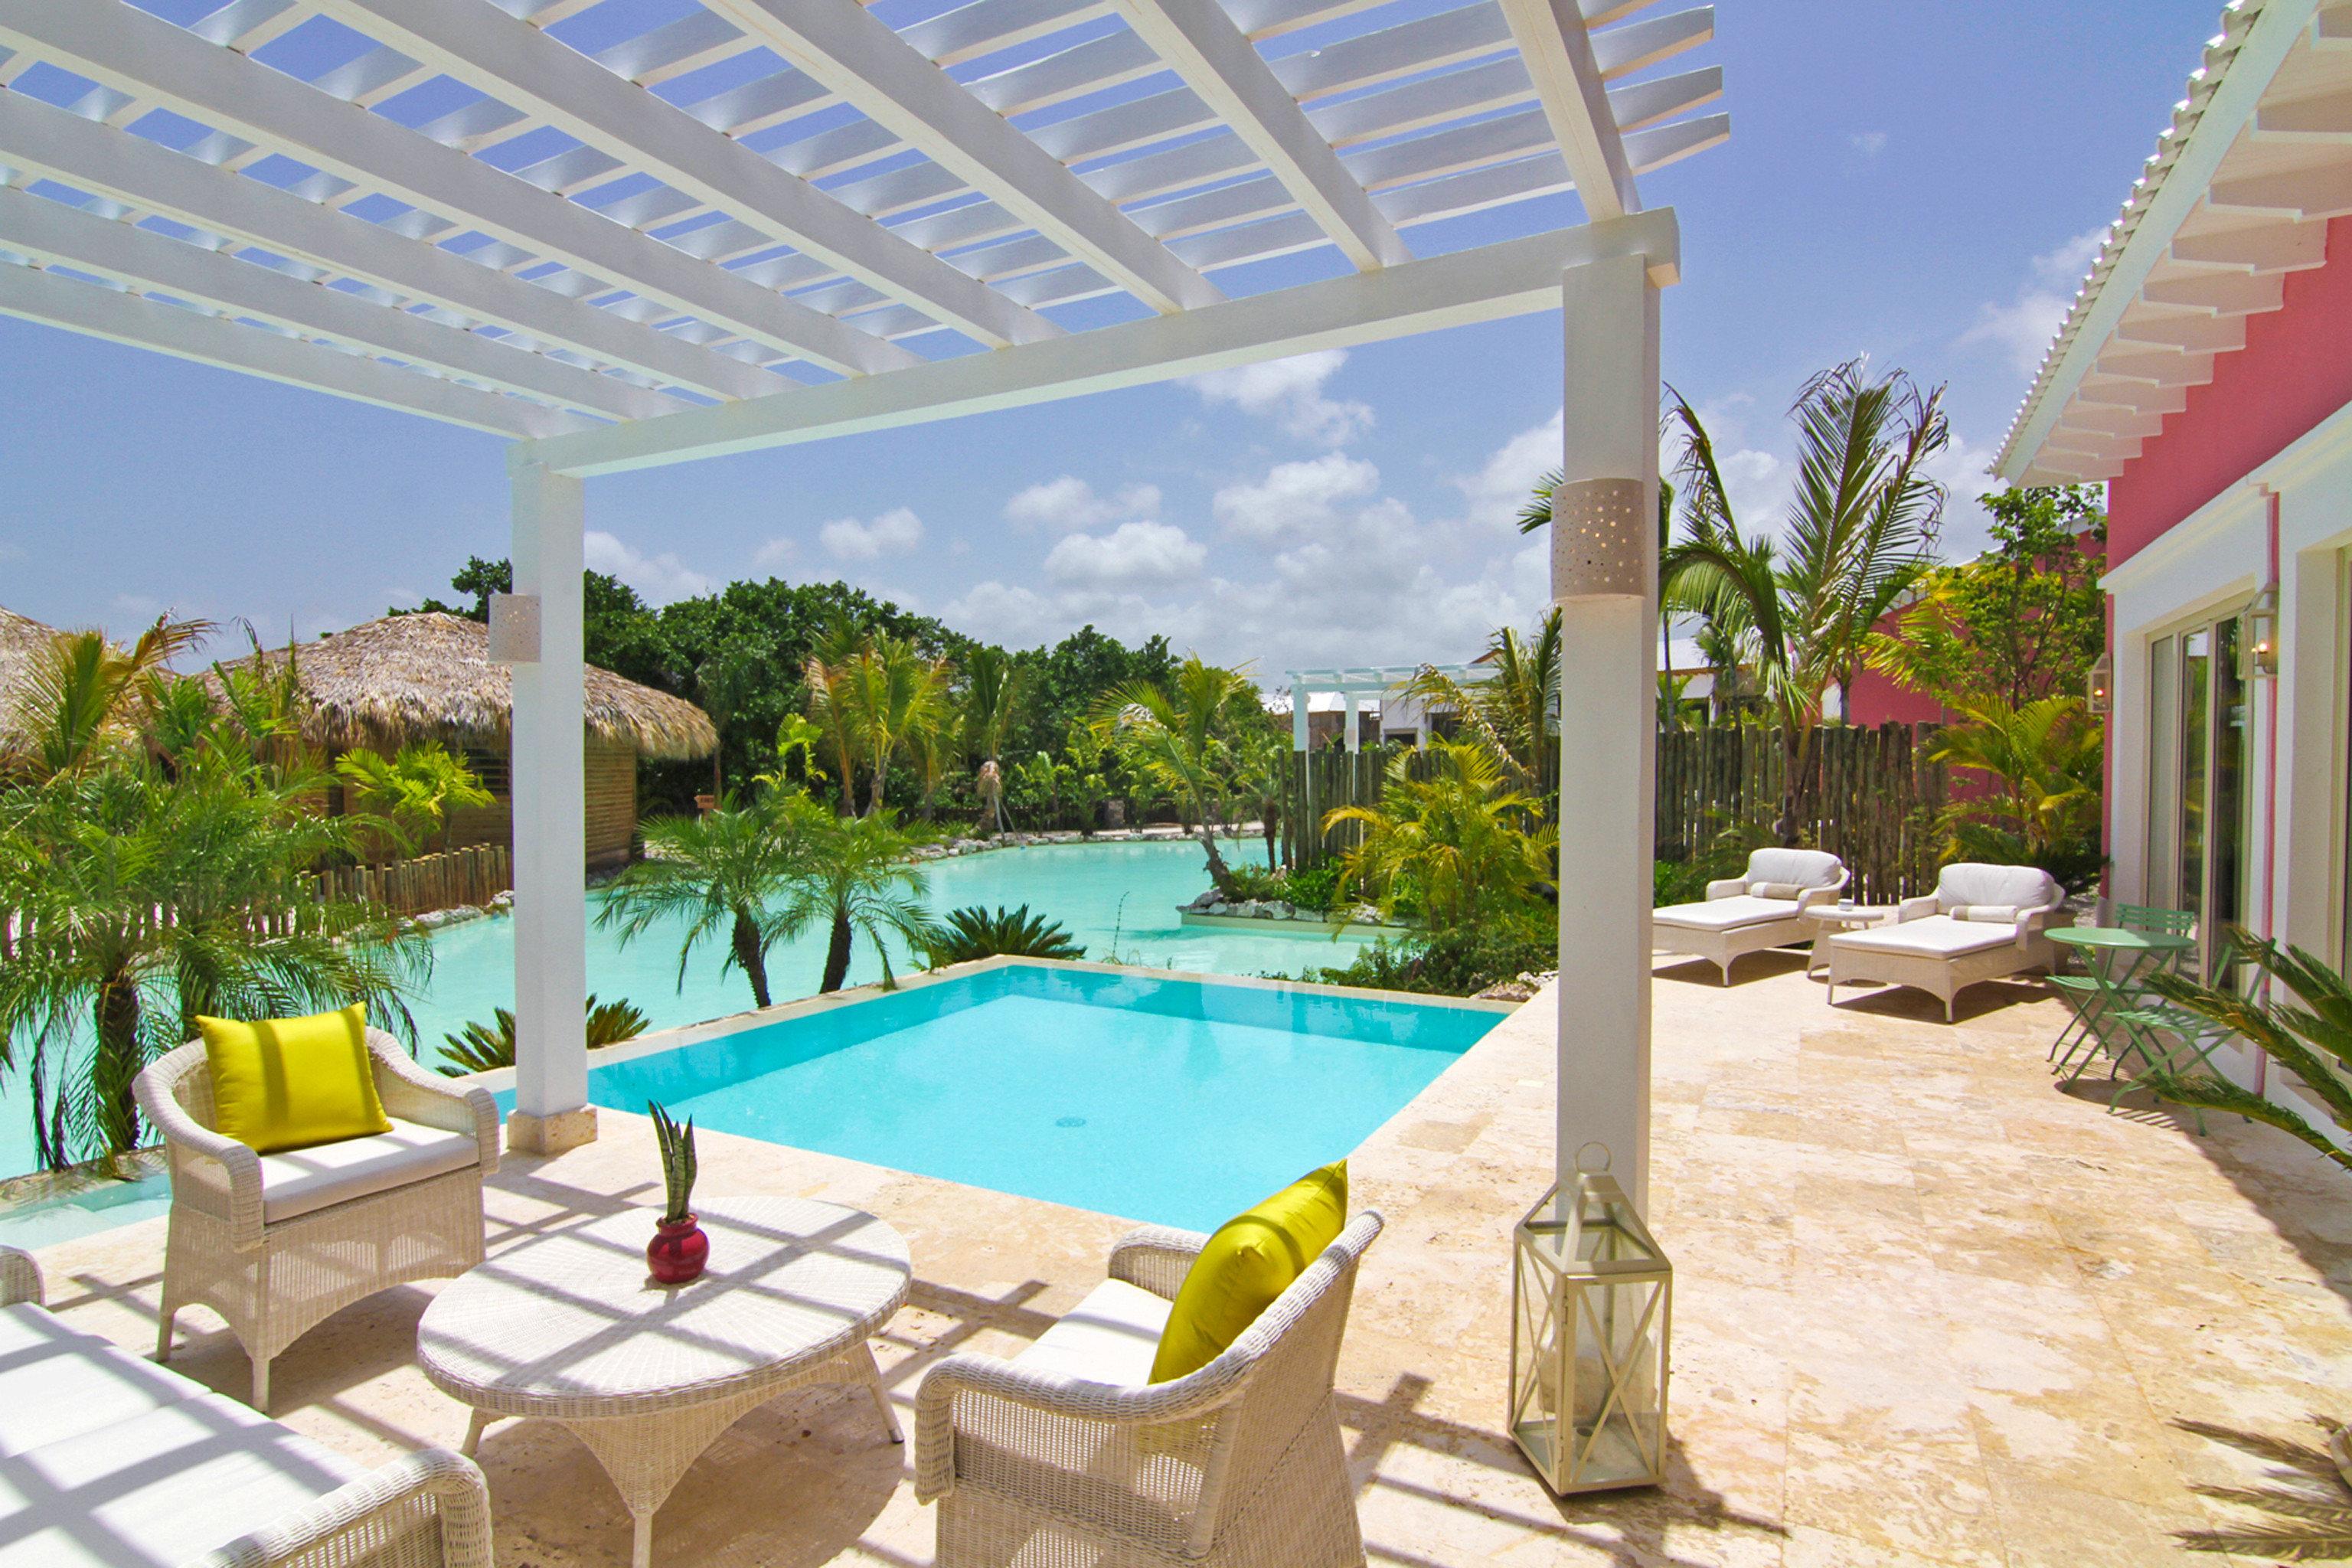 Hotels outdoor property swimming pool Resort Villa estate condominium vacation real estate Pool backyard hacienda home outdoor structure eco hotel apartment furniture several